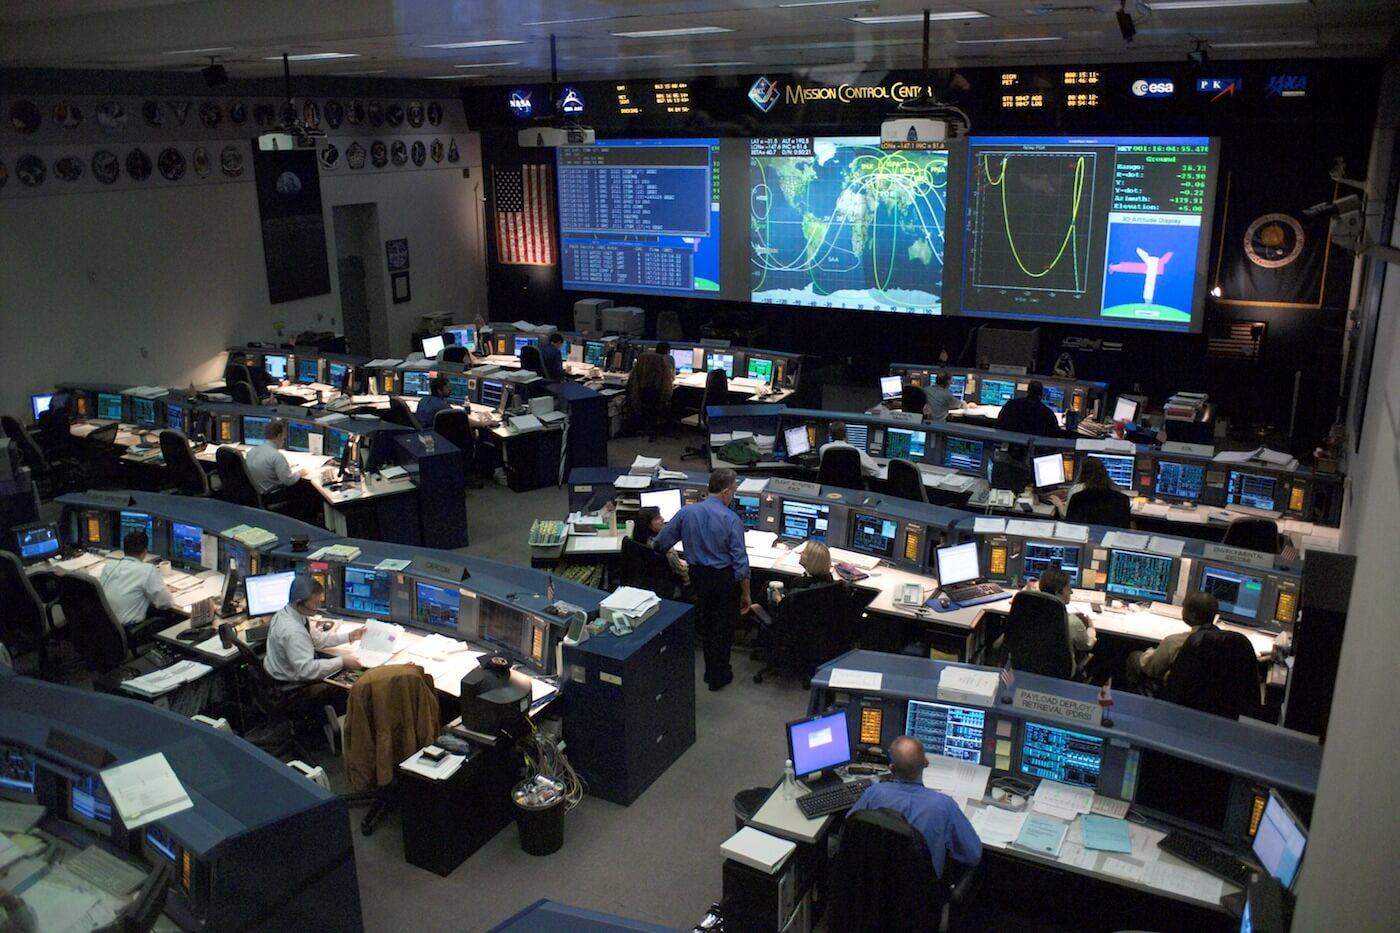 nasa-mission-control-center-monitoring